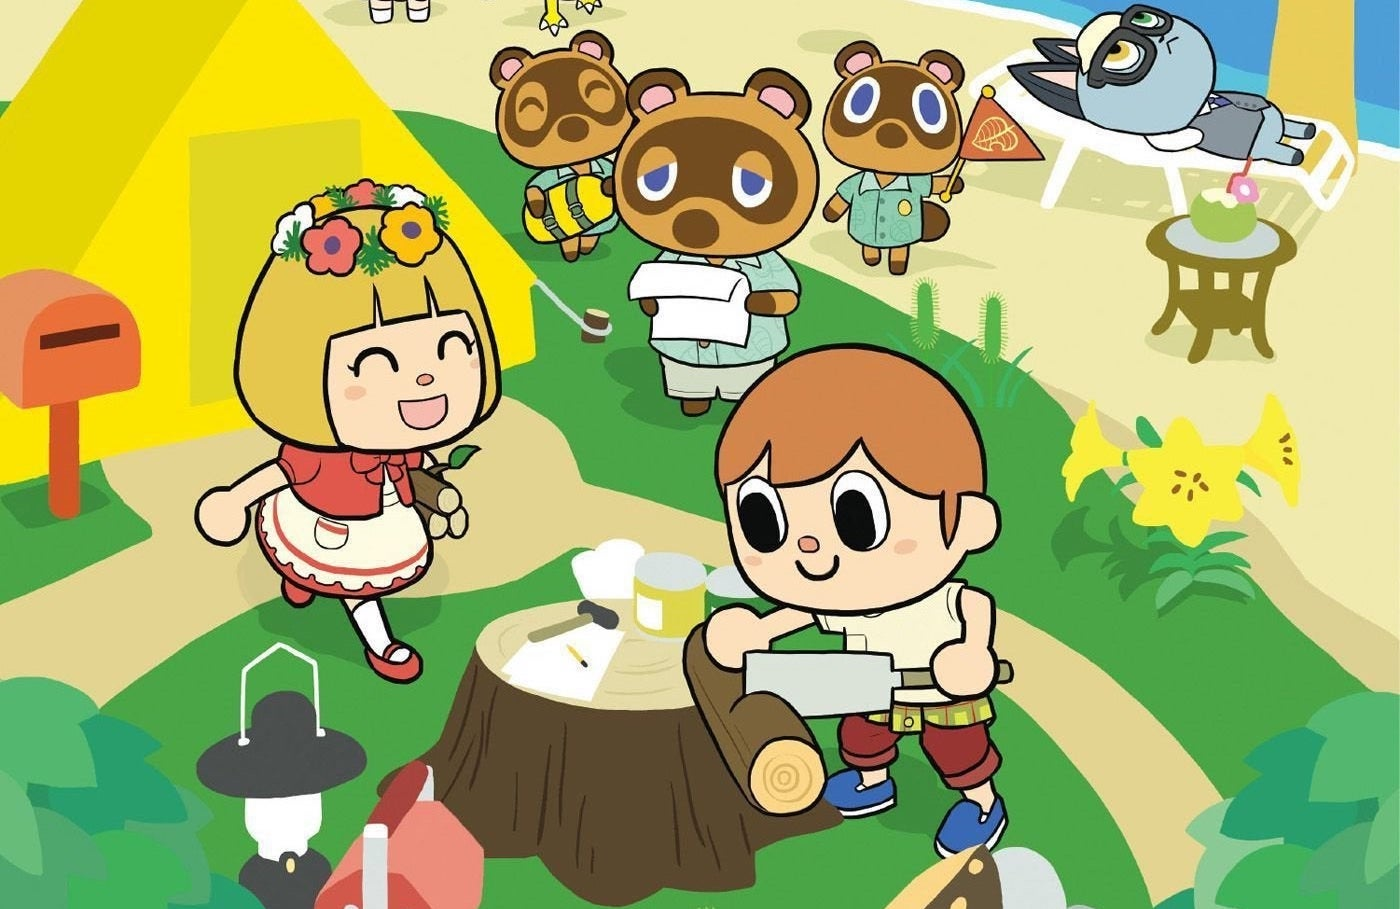 Animal Crossing: New Horizons Vol. 1 Deserted Island Diaries